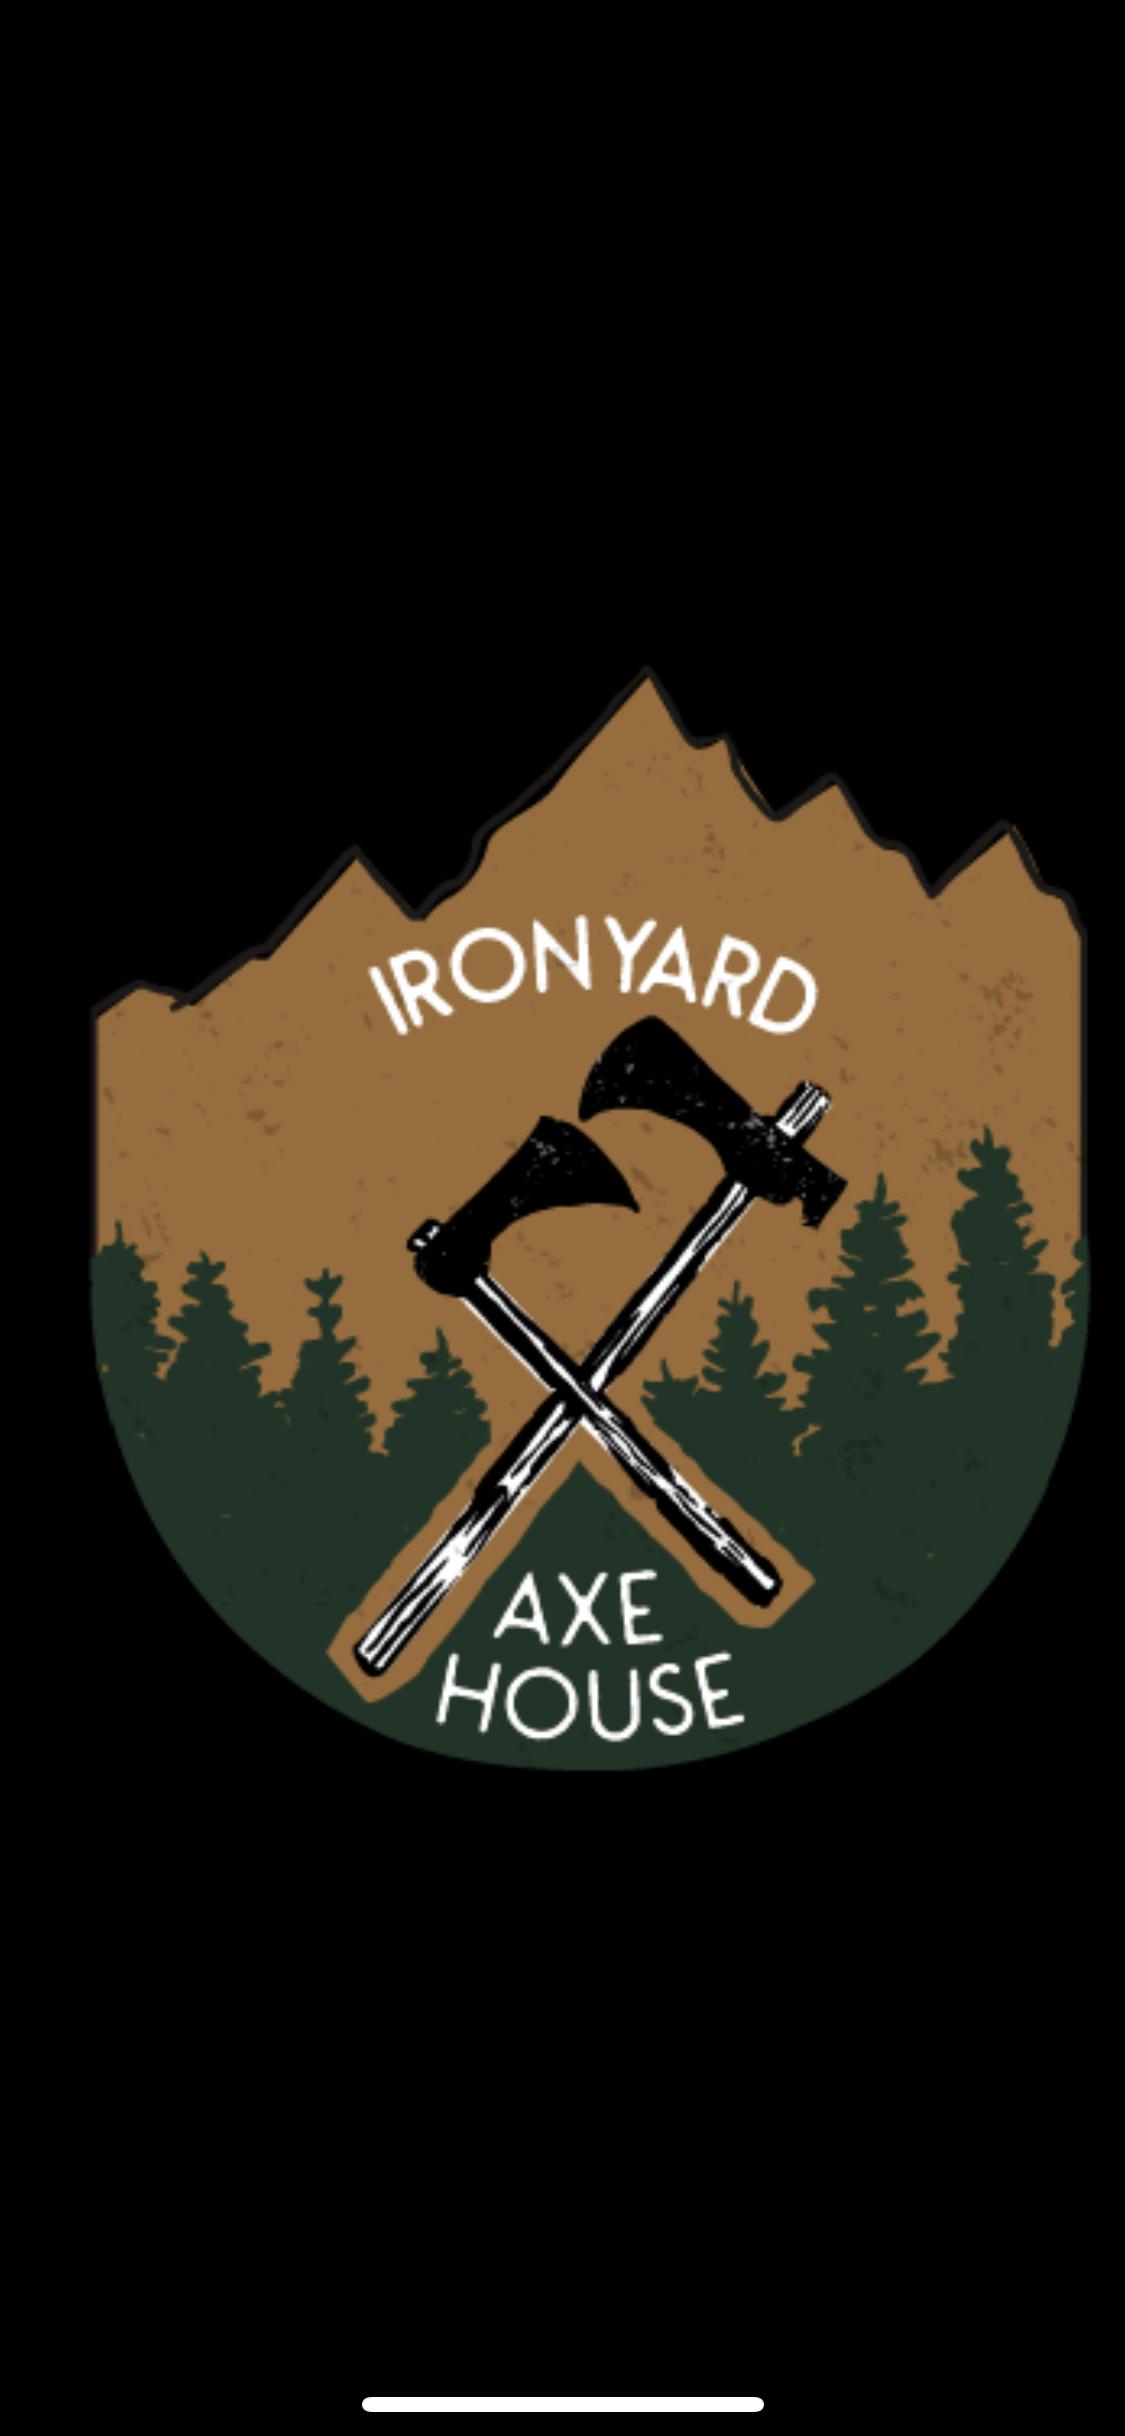 IronYard AxeHouse  Logo